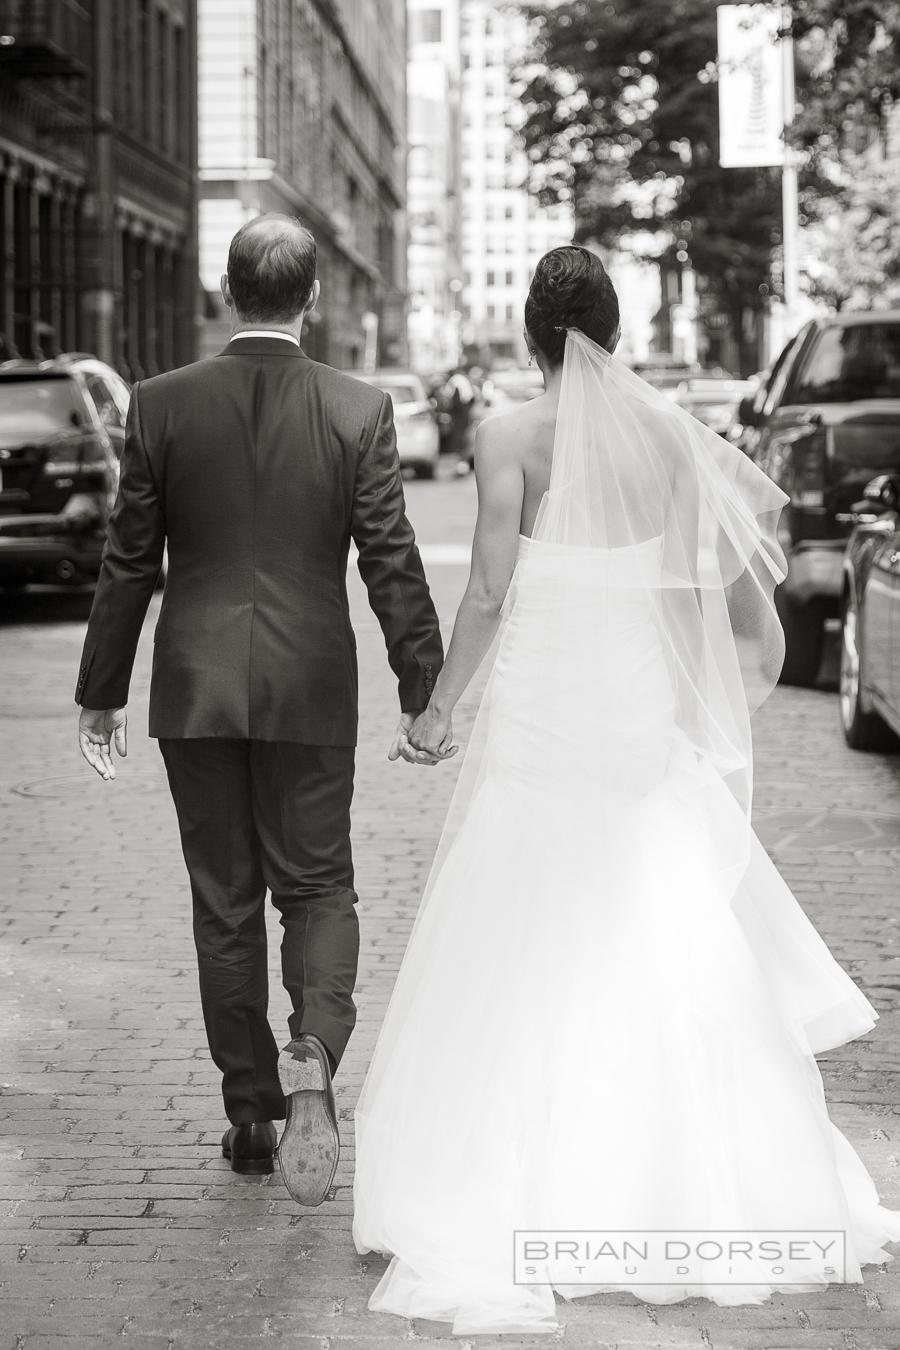 isola nomo soho hotel wedding brian dorsey studios ang weddings and events-13.jpg